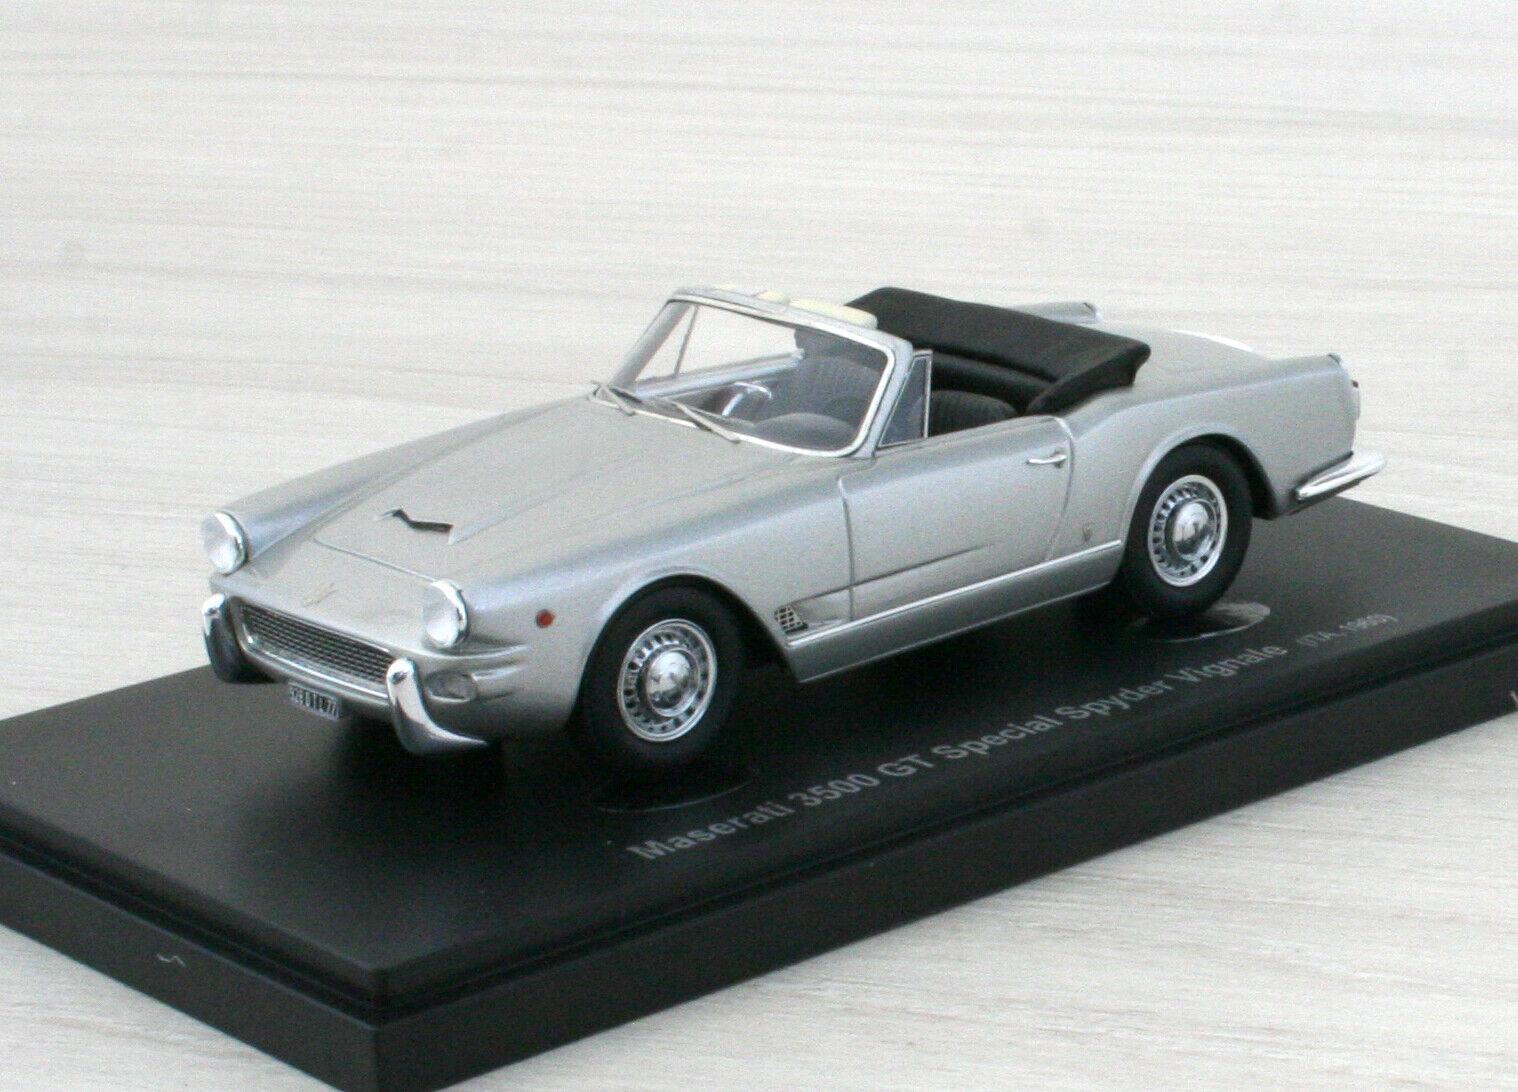 MASERATI 3500 GT Spyder Vignale 1960 - AVENUE 43 AVN60019 - 1 43